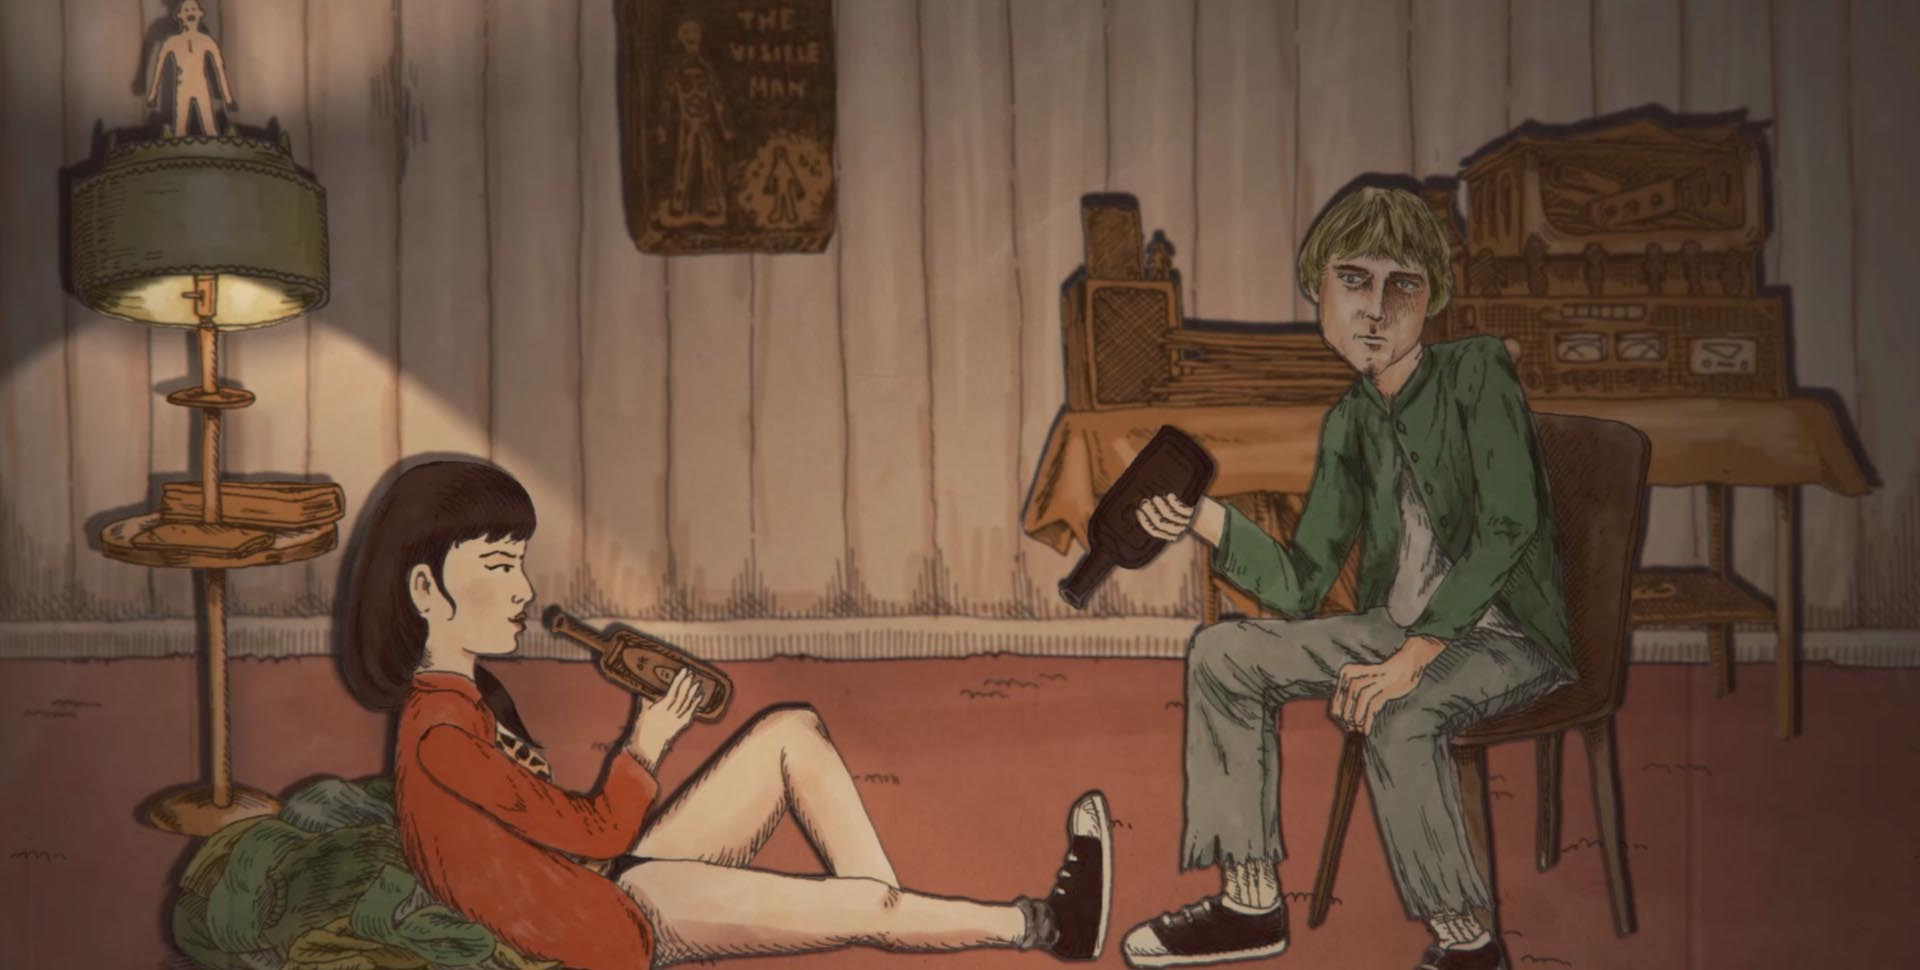 http://mdfilmfest.com/wp-content/uploads/DR_Teen_Spirit_web.jpg